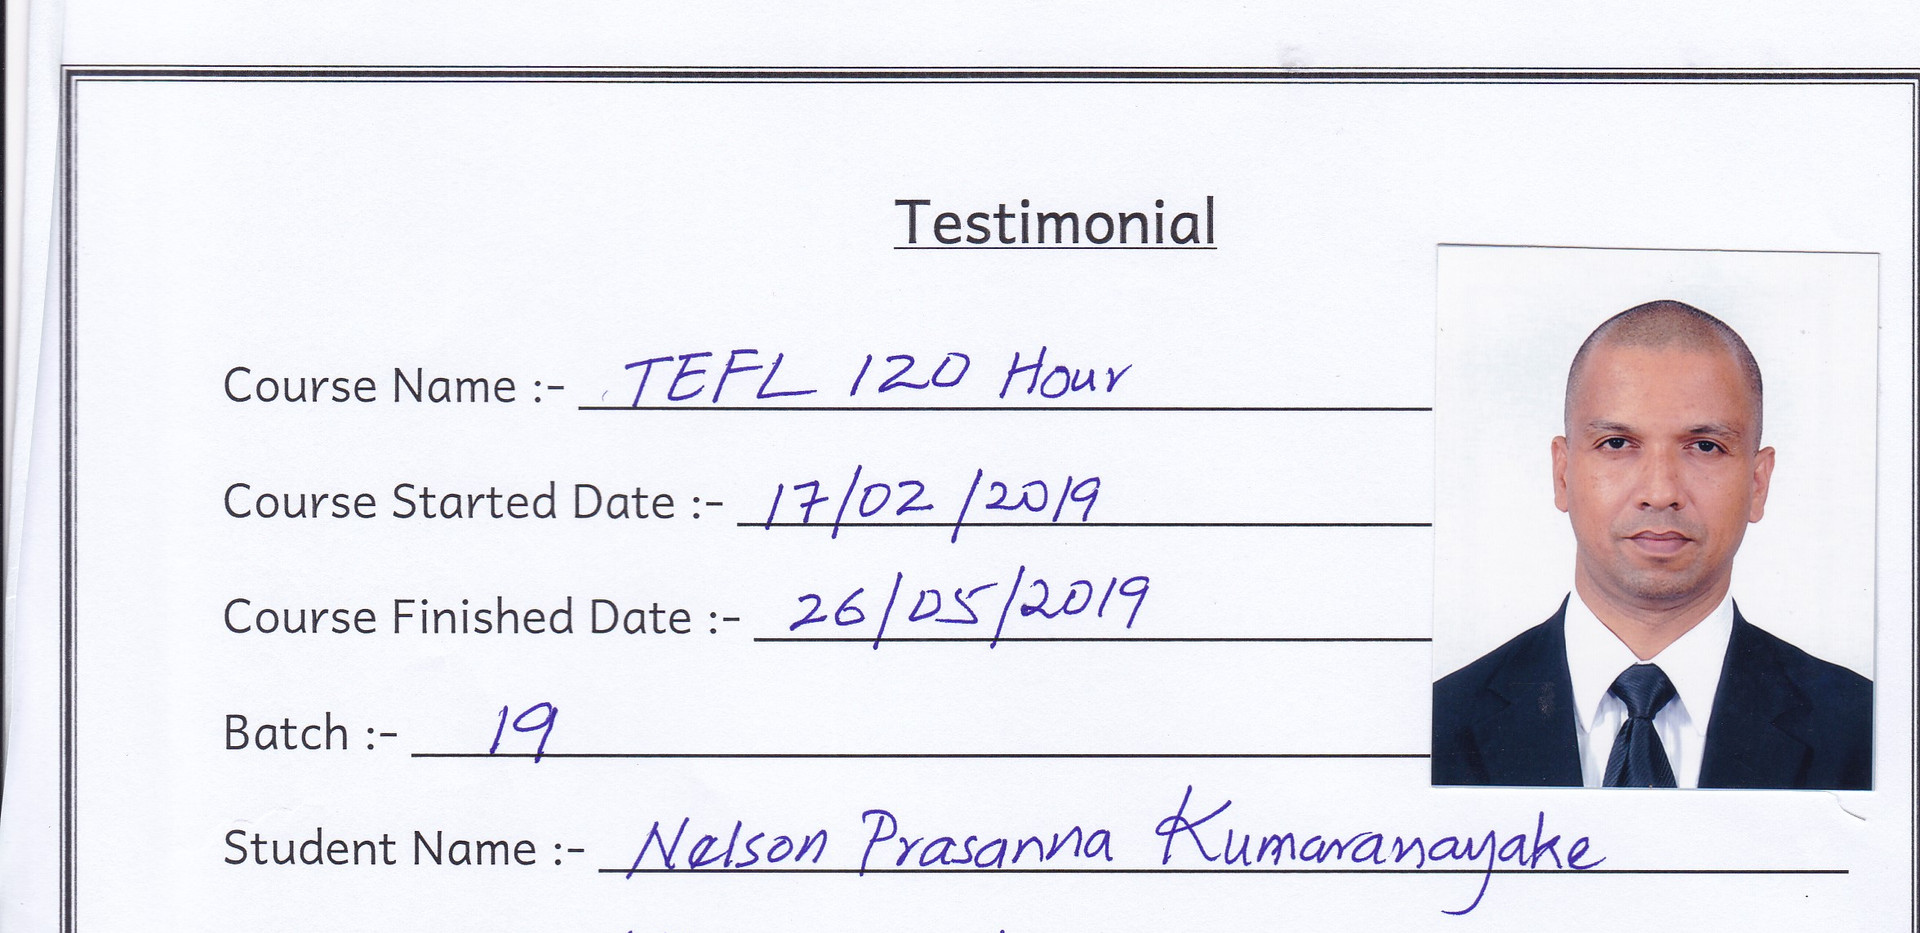 Nelson Prasanna Kumaranayake.jpg